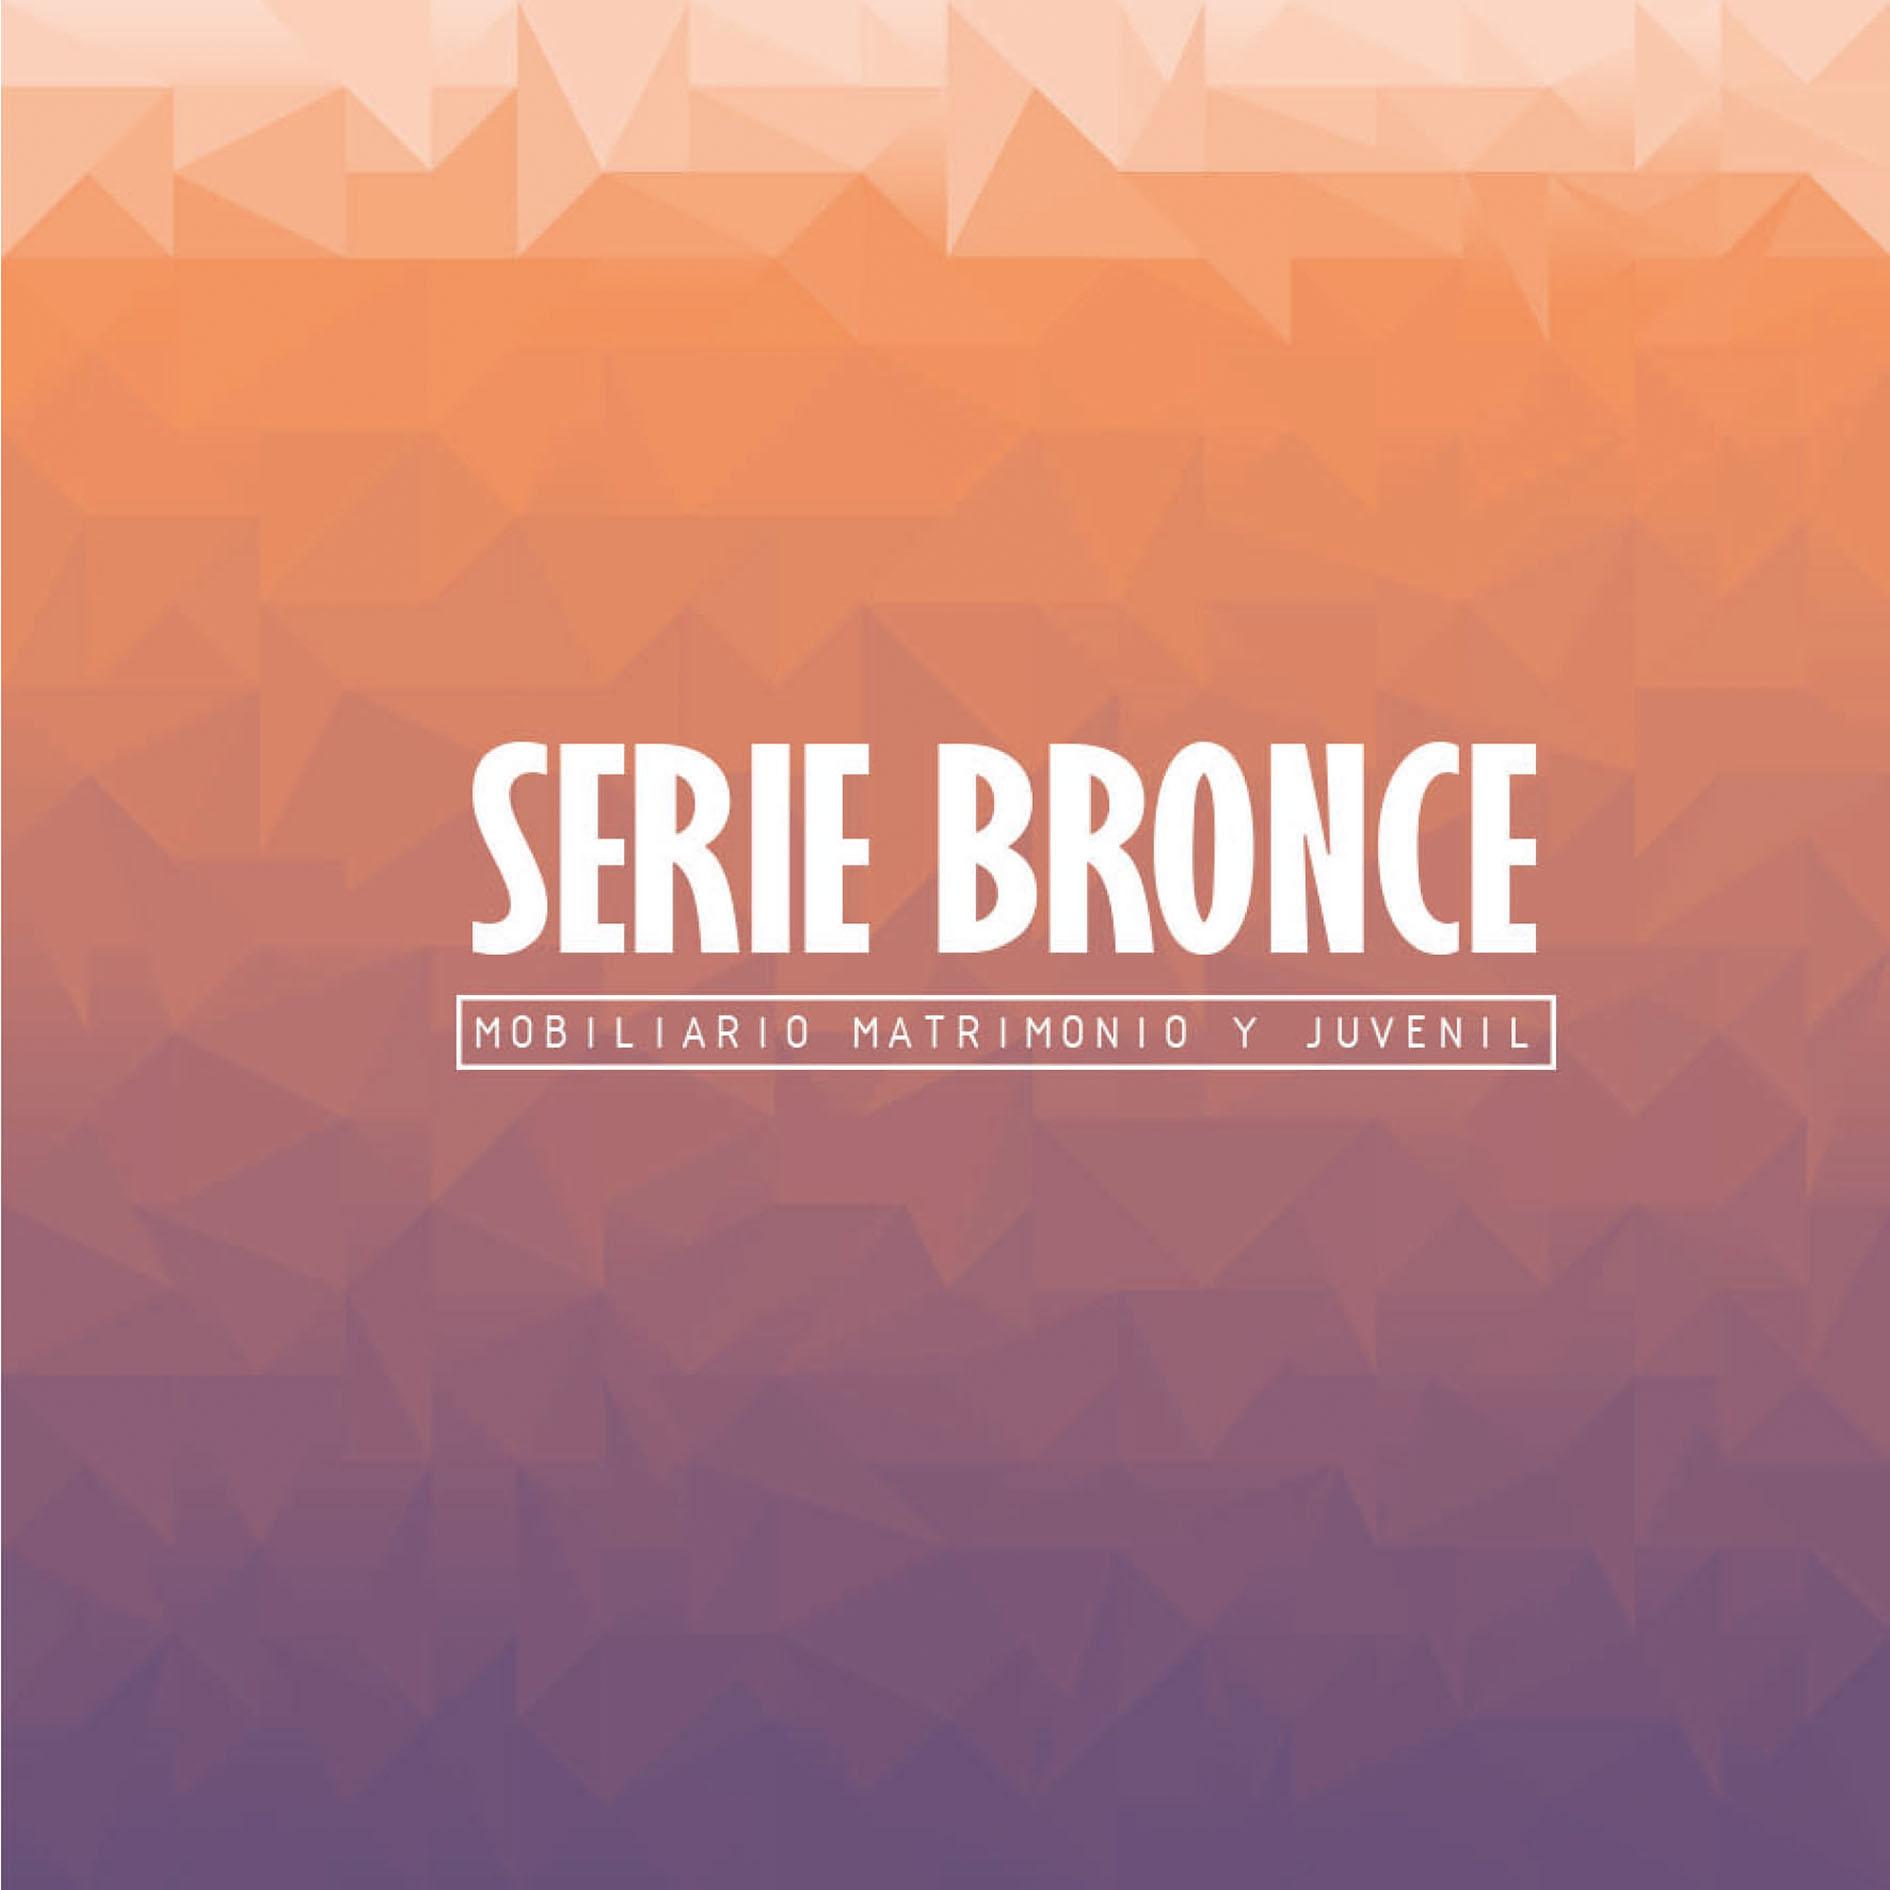 SerieBronce_baja_Página_01